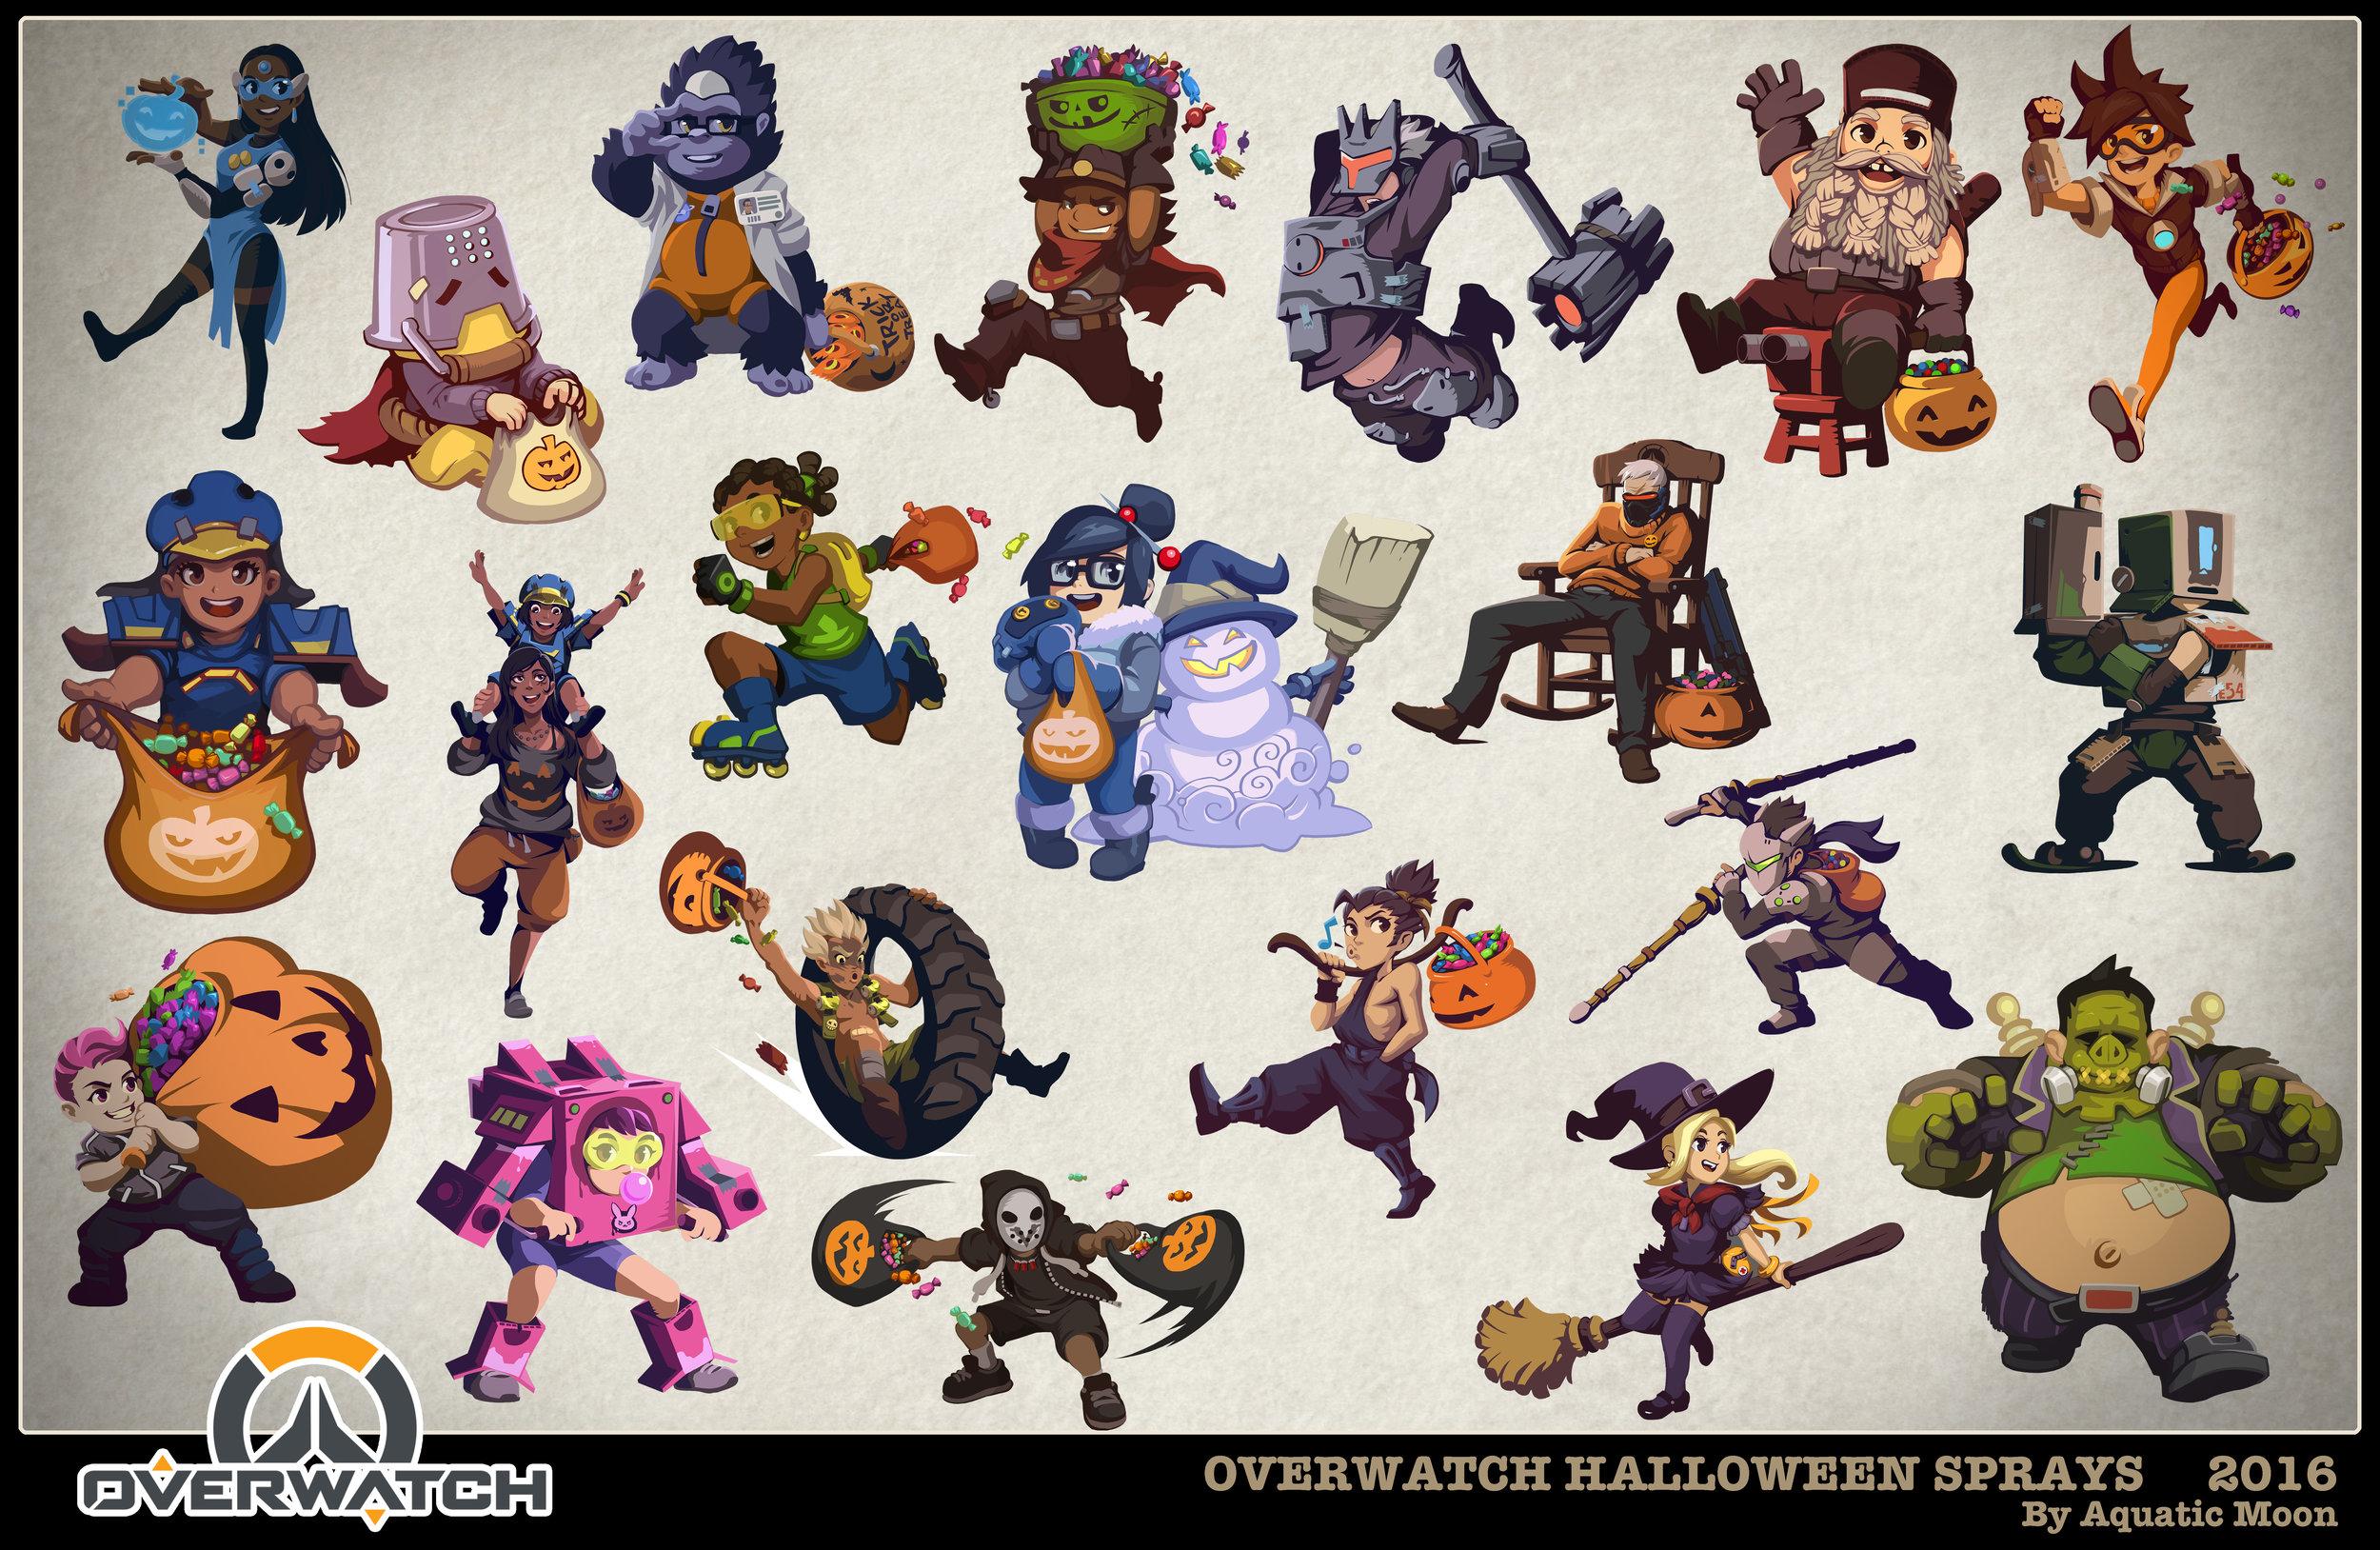 24-Overwatch sprays halloween.jpg